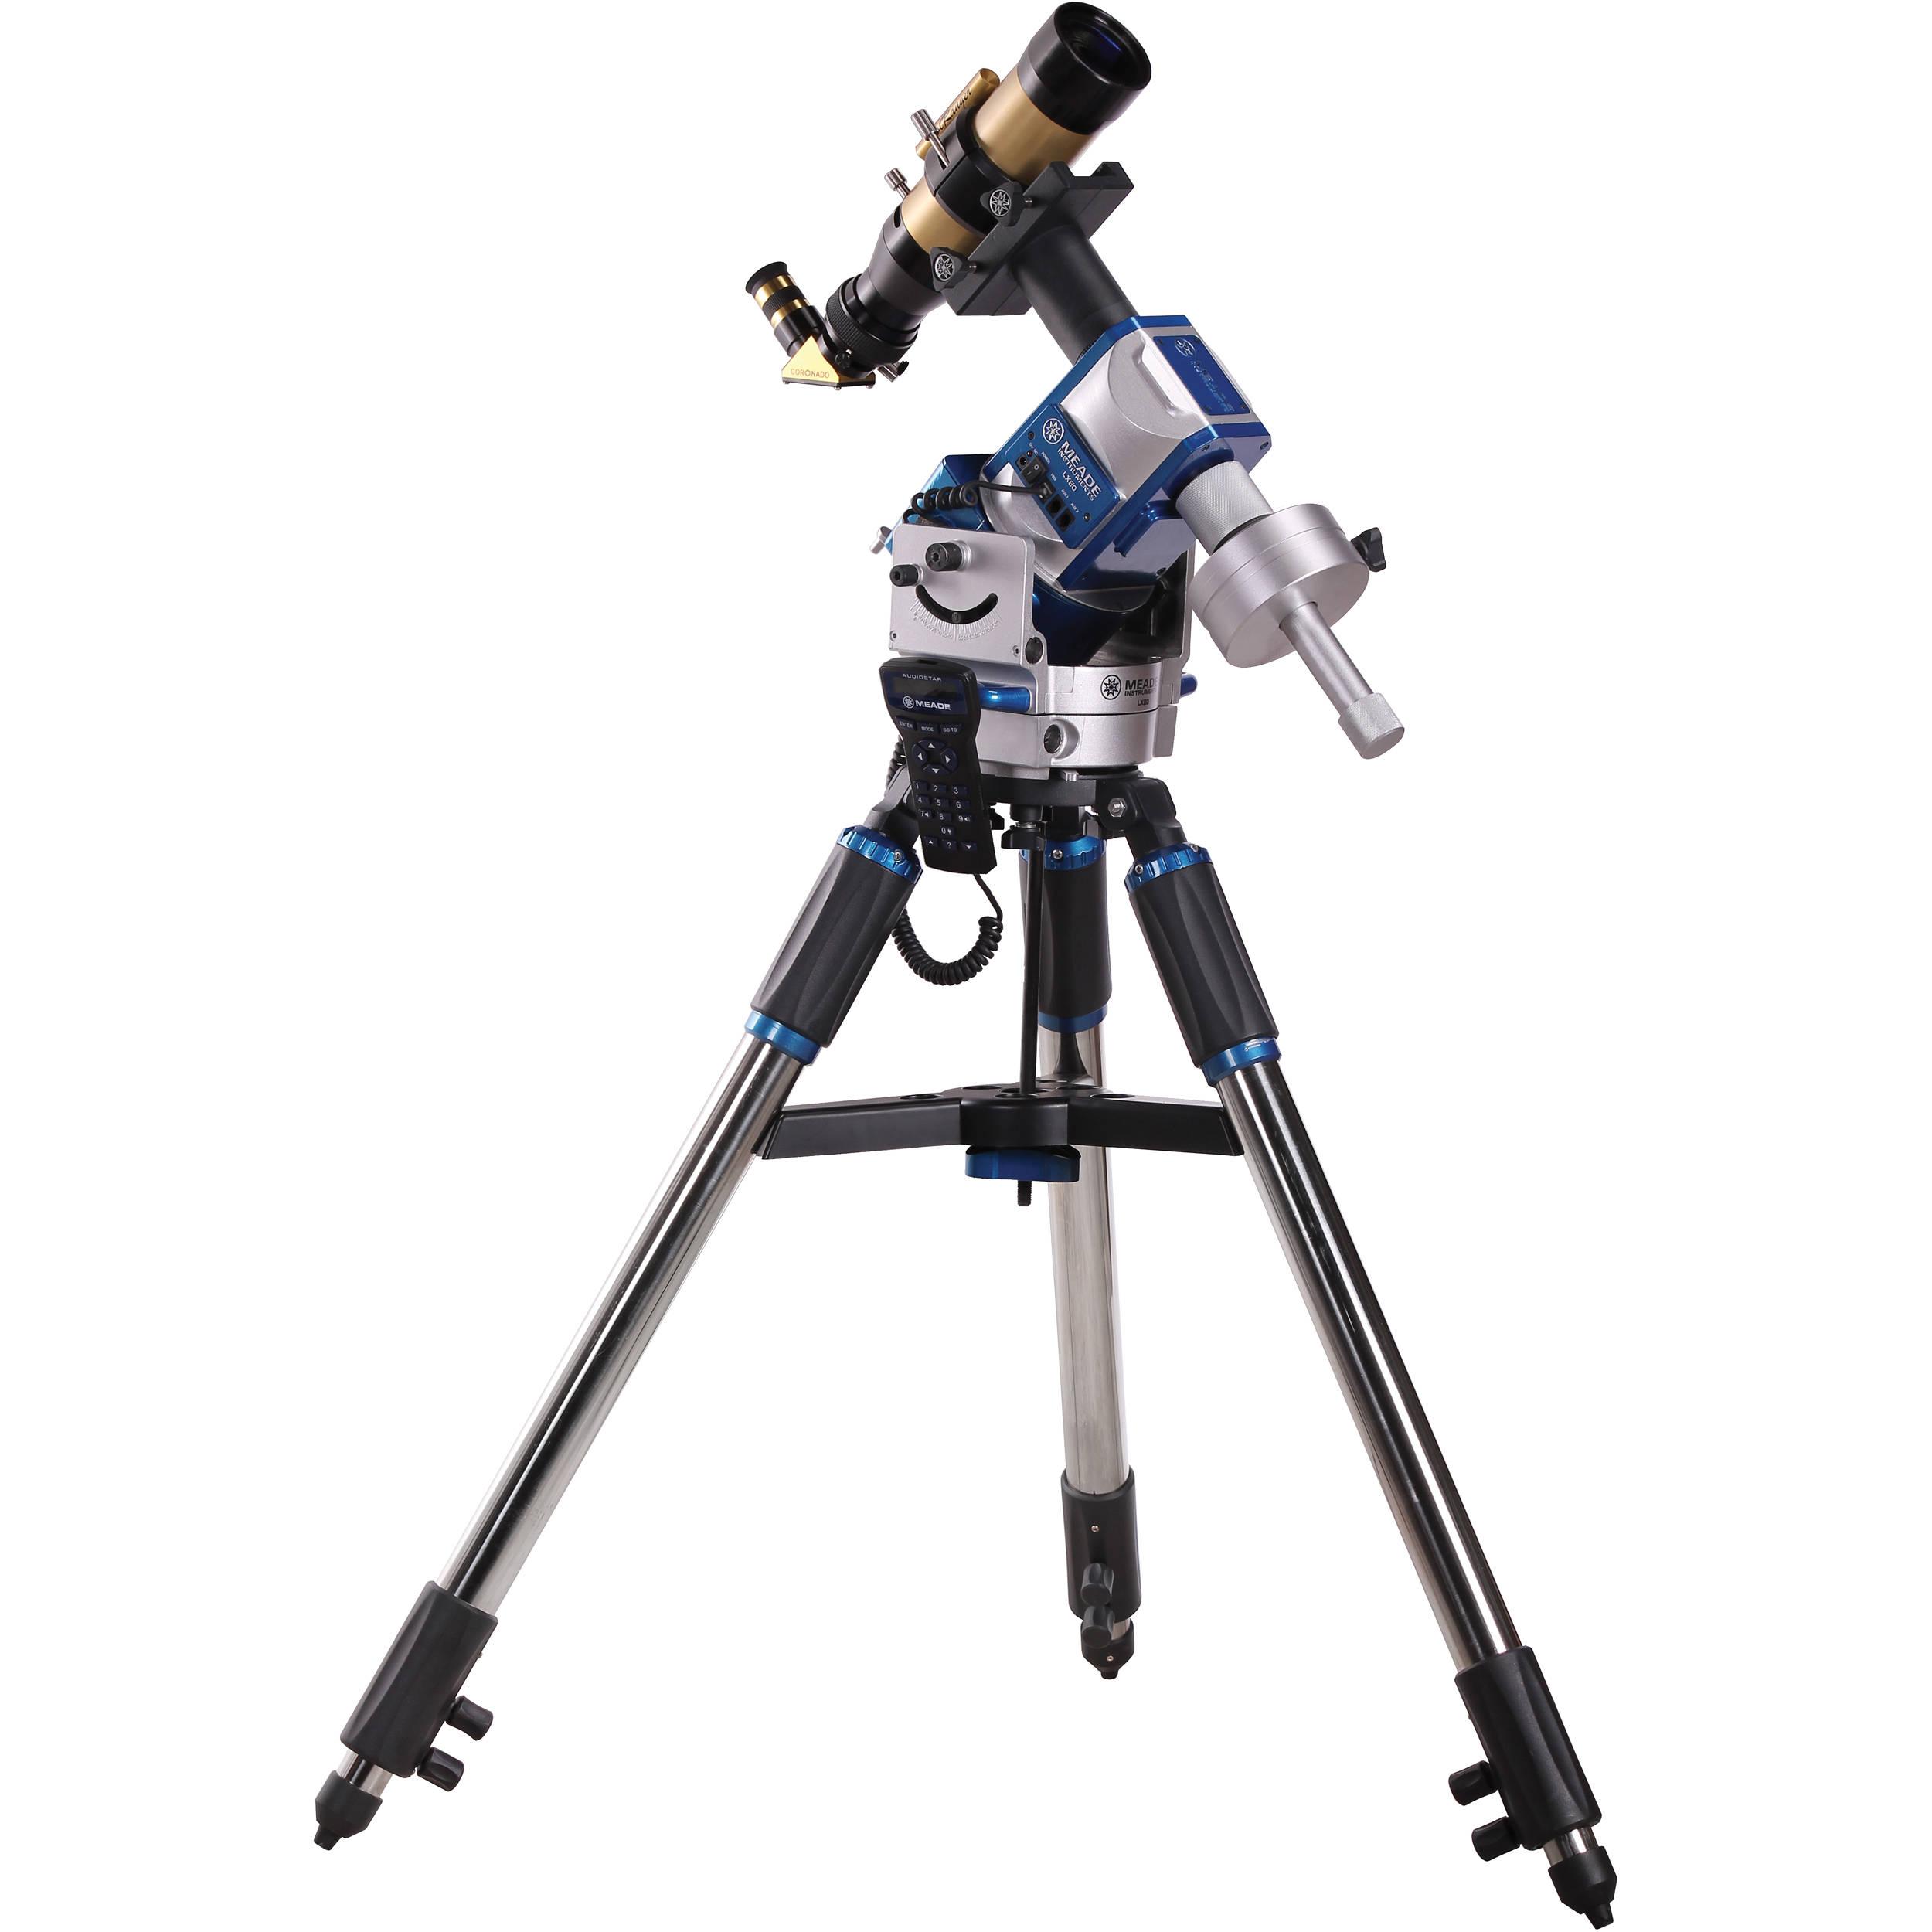 Meade 60mm Coronado SolarMax II Telescope SMT60-10-LX80 B&H